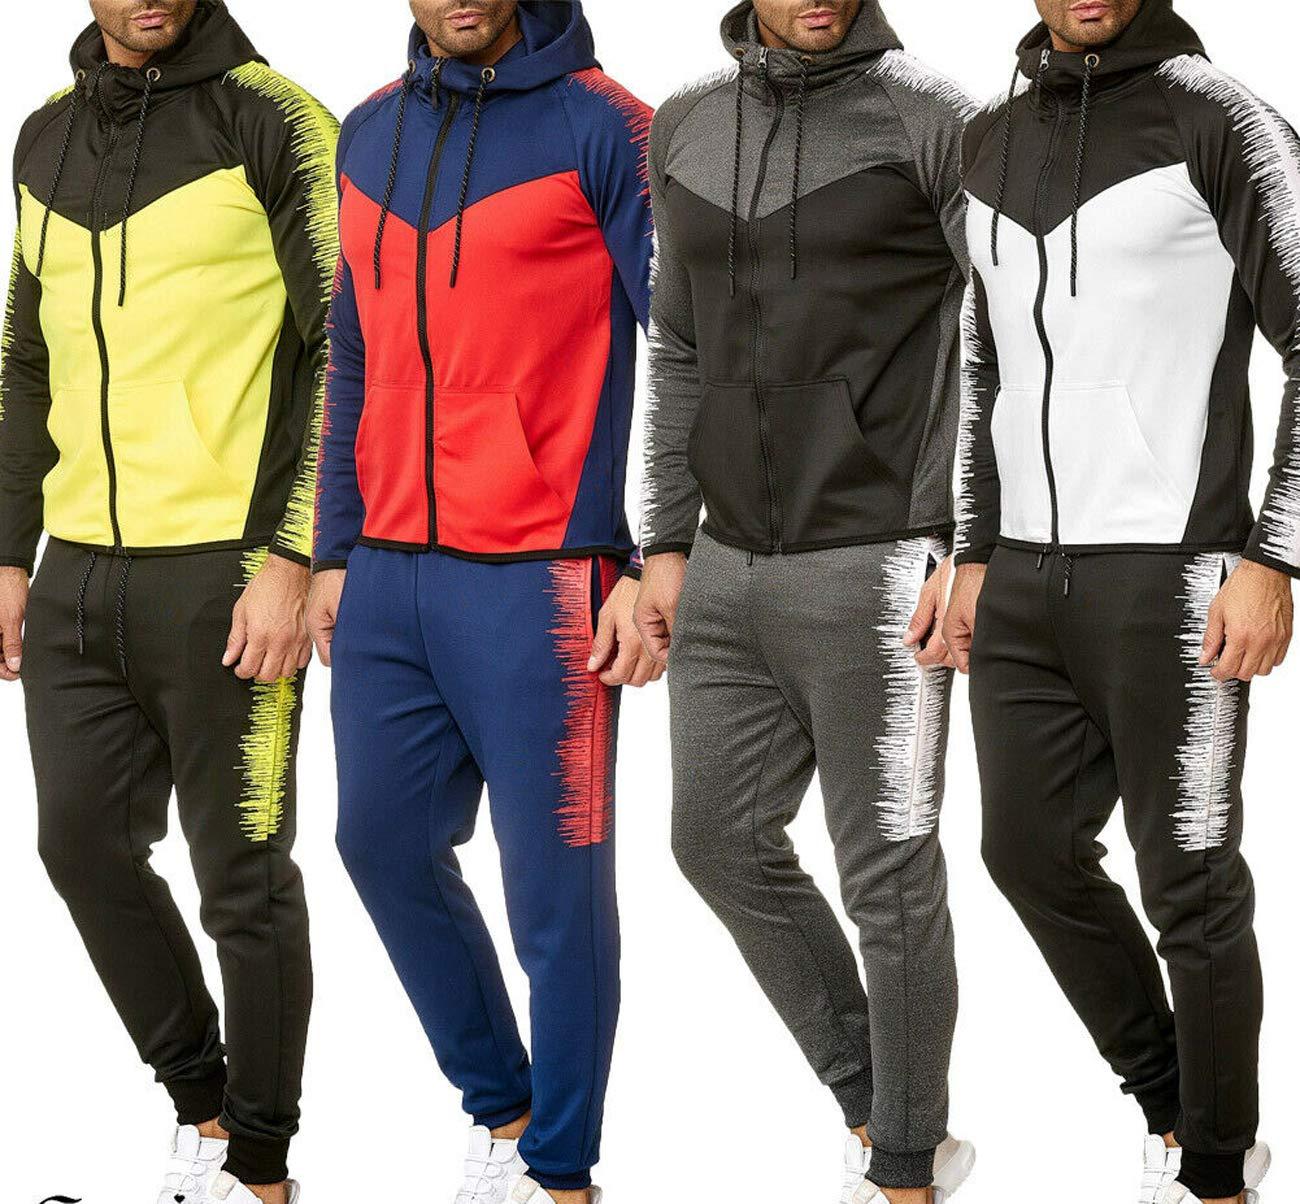 $250 NWT KAIMOS Men/'s 213 Black Sweatsuit Set Hoodie Jacket Pants Joggers SMALL